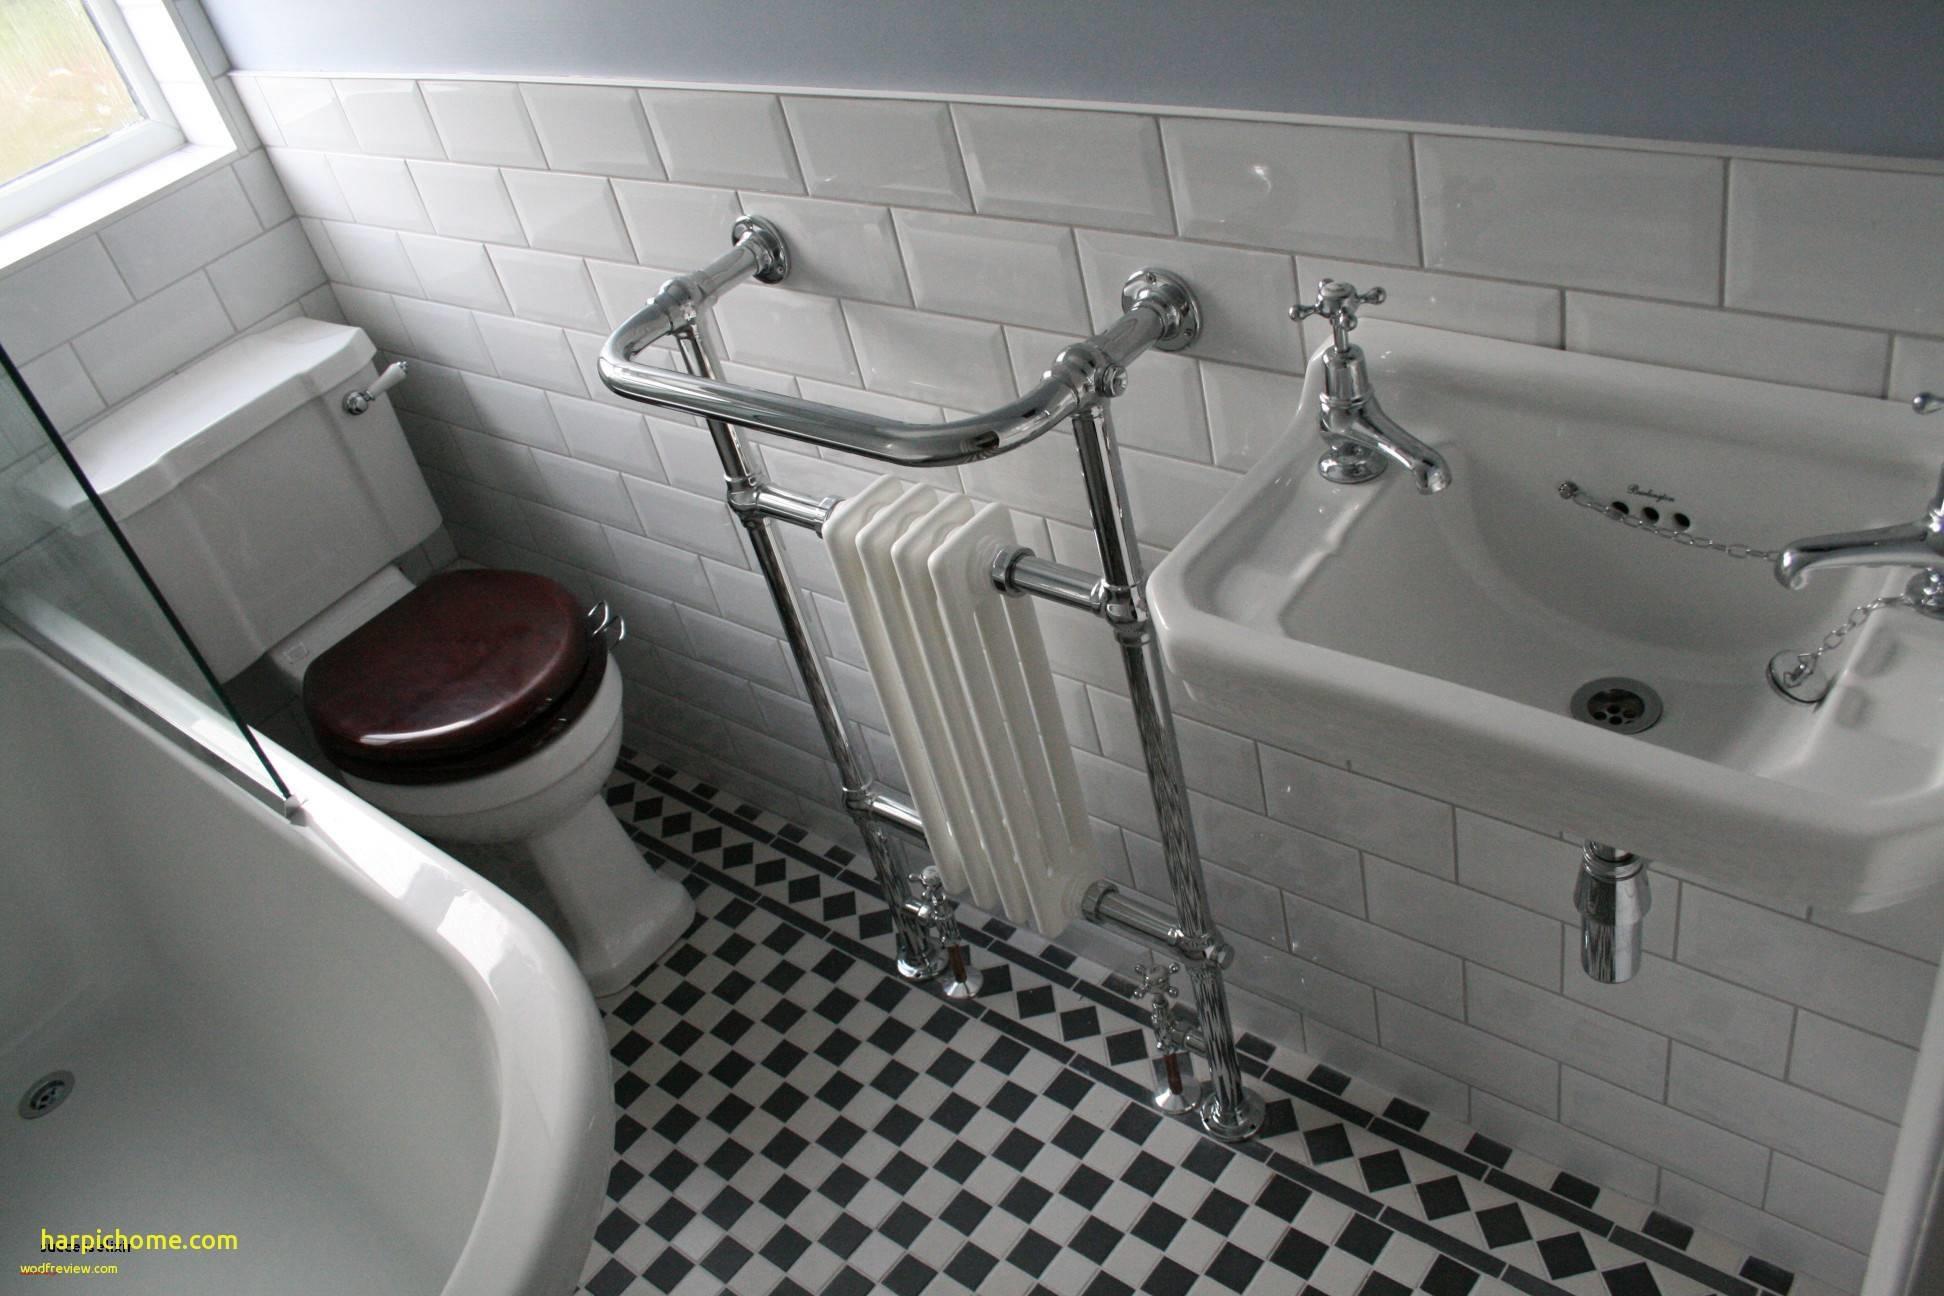 Small Guest Bathroom Ideas Guest Bathroom Designs Guest Bathroom Decor Ideas Bathroom Decor White Bathroom Ideas Small Bathrooms Ideas Bathroom Small Half